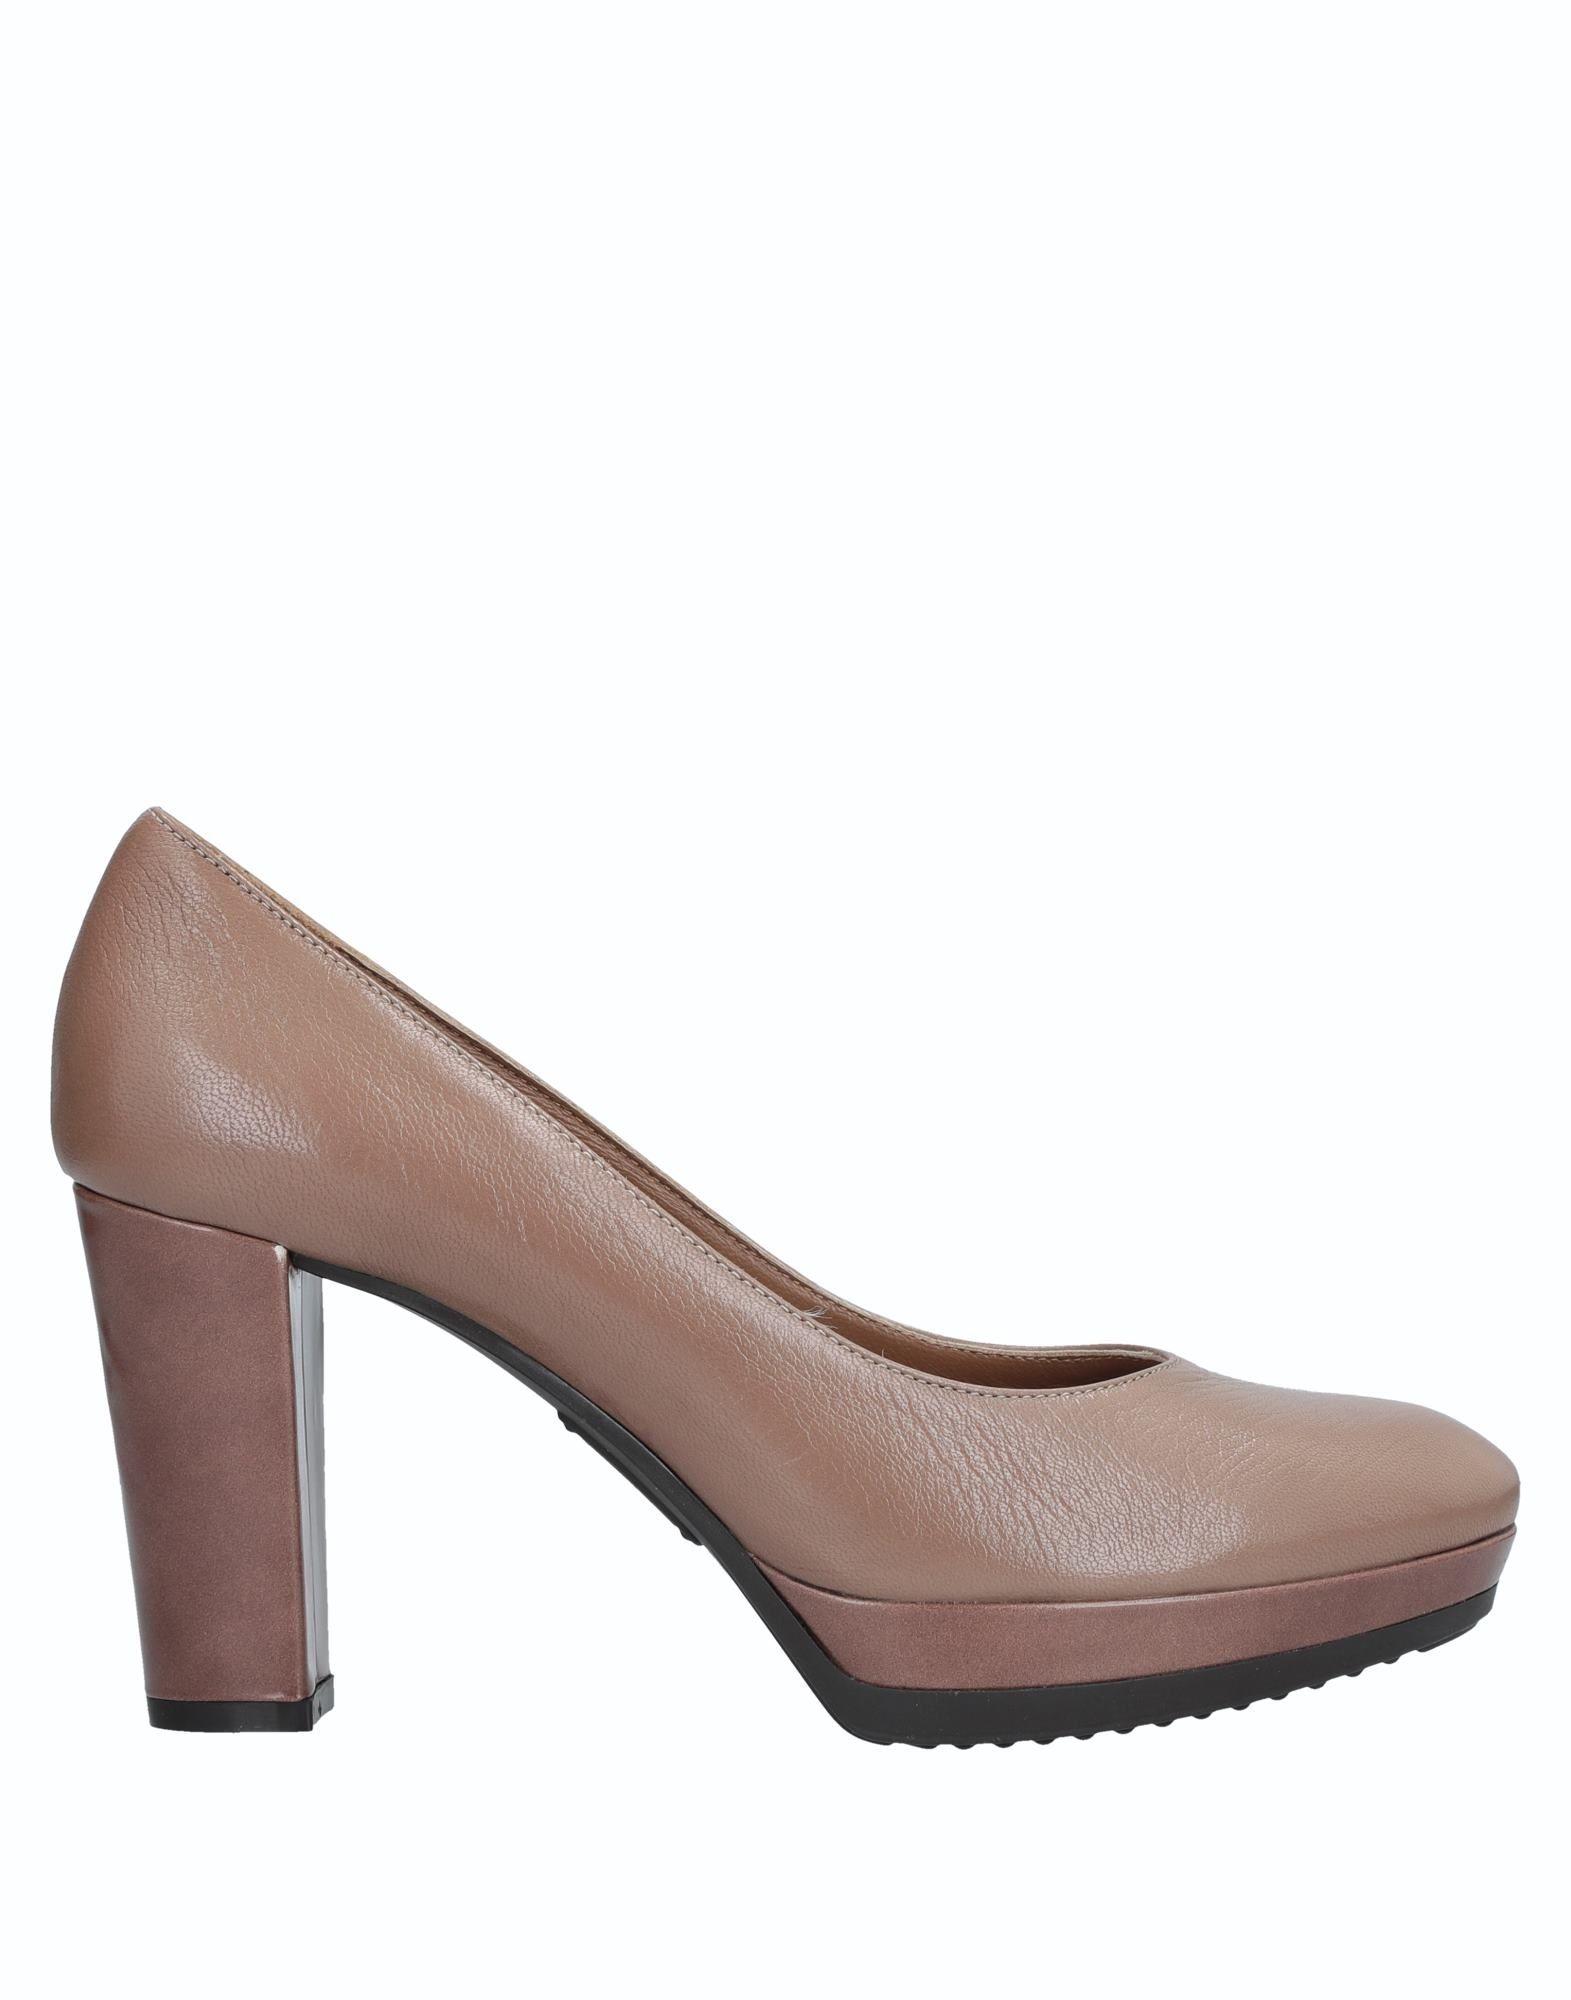 1,618 11537330PV Pumps Damen  11537330PV 1,618 Gute Qualität beliebte Schuhe 6e660c